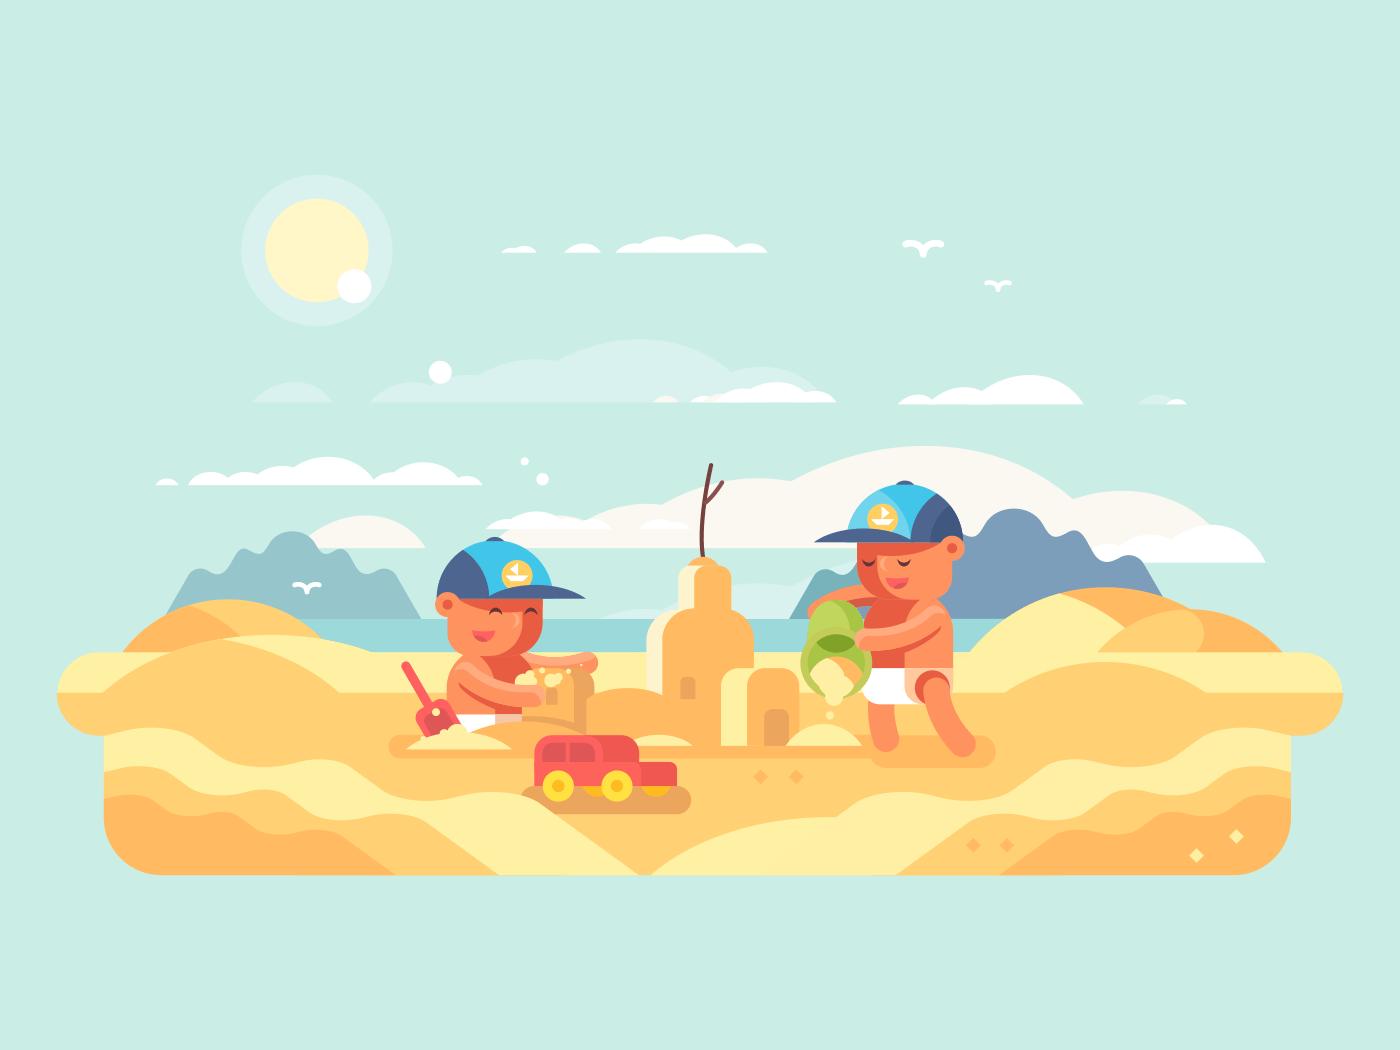 Sand castle on beach flat vector illustration